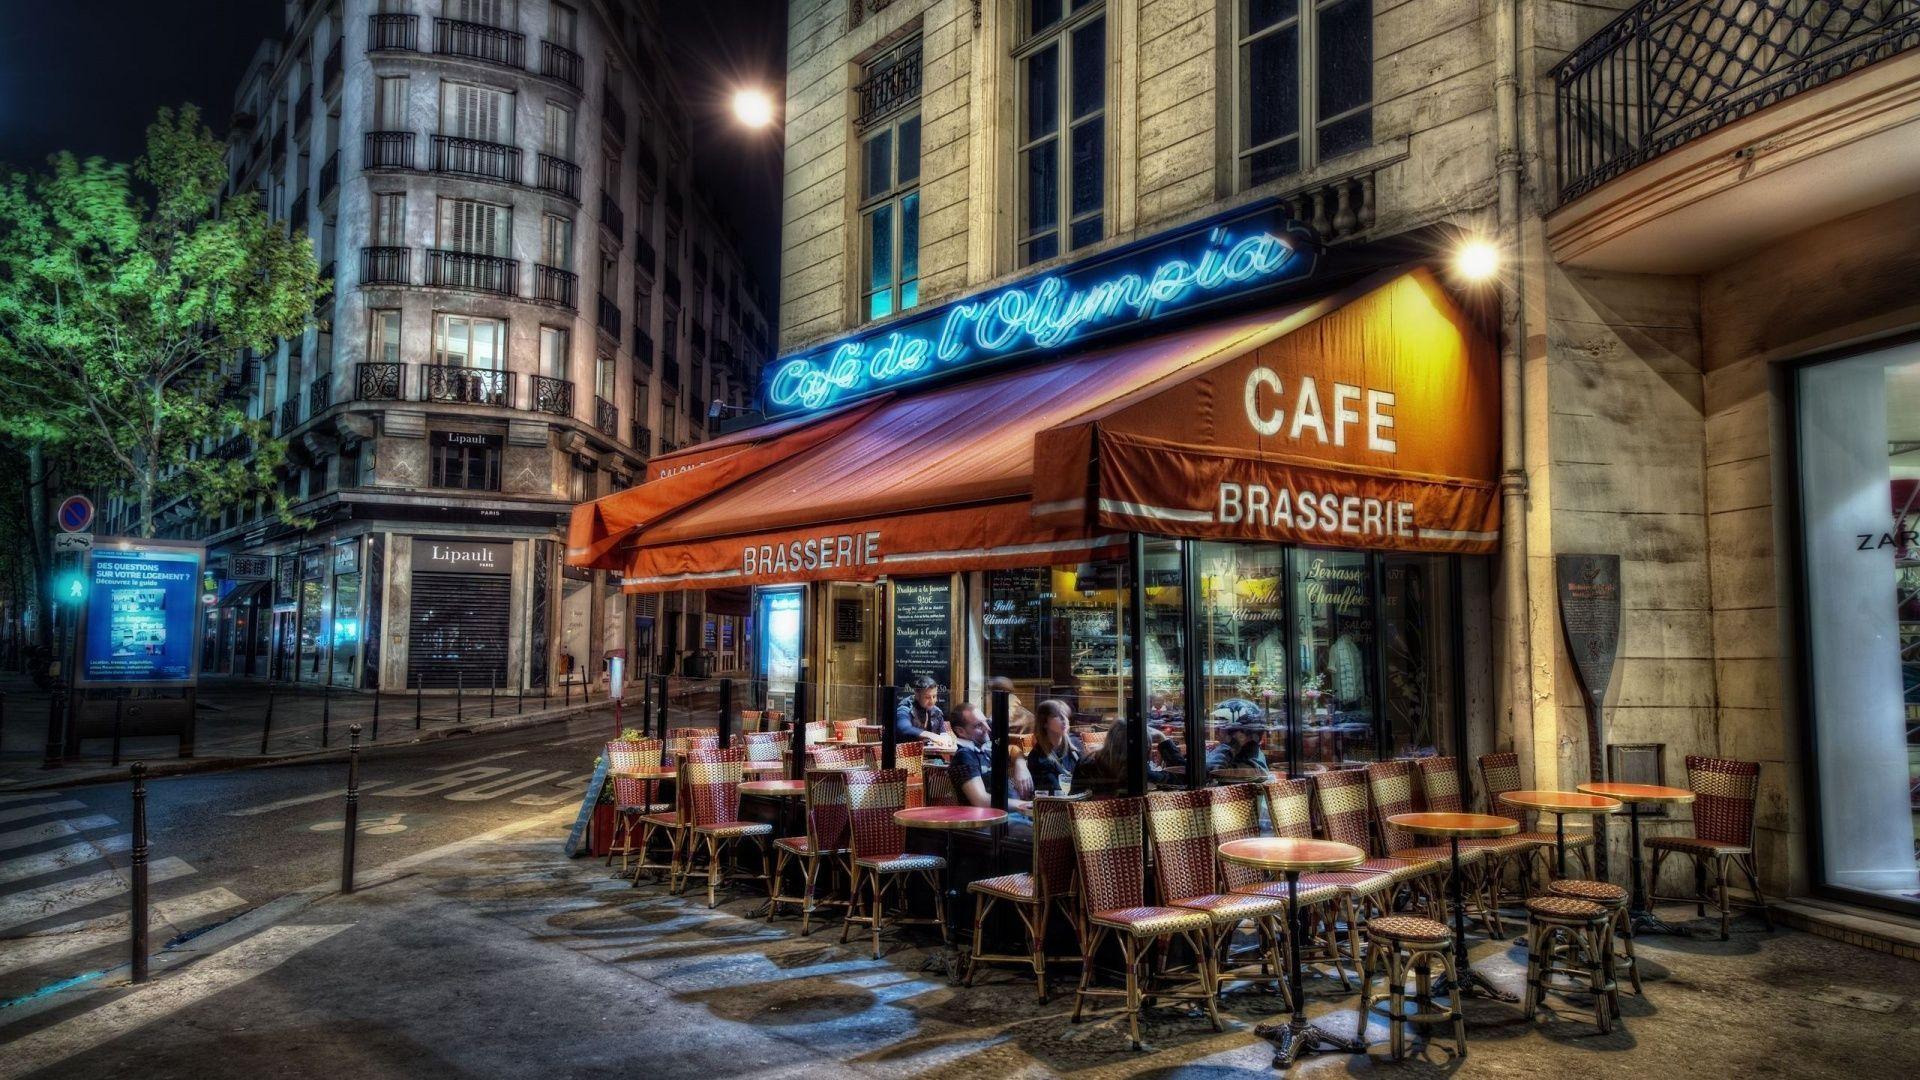 Paris Cafe Wallpapers Top Free Paris Cafe Backgrounds Wallpaperaccess